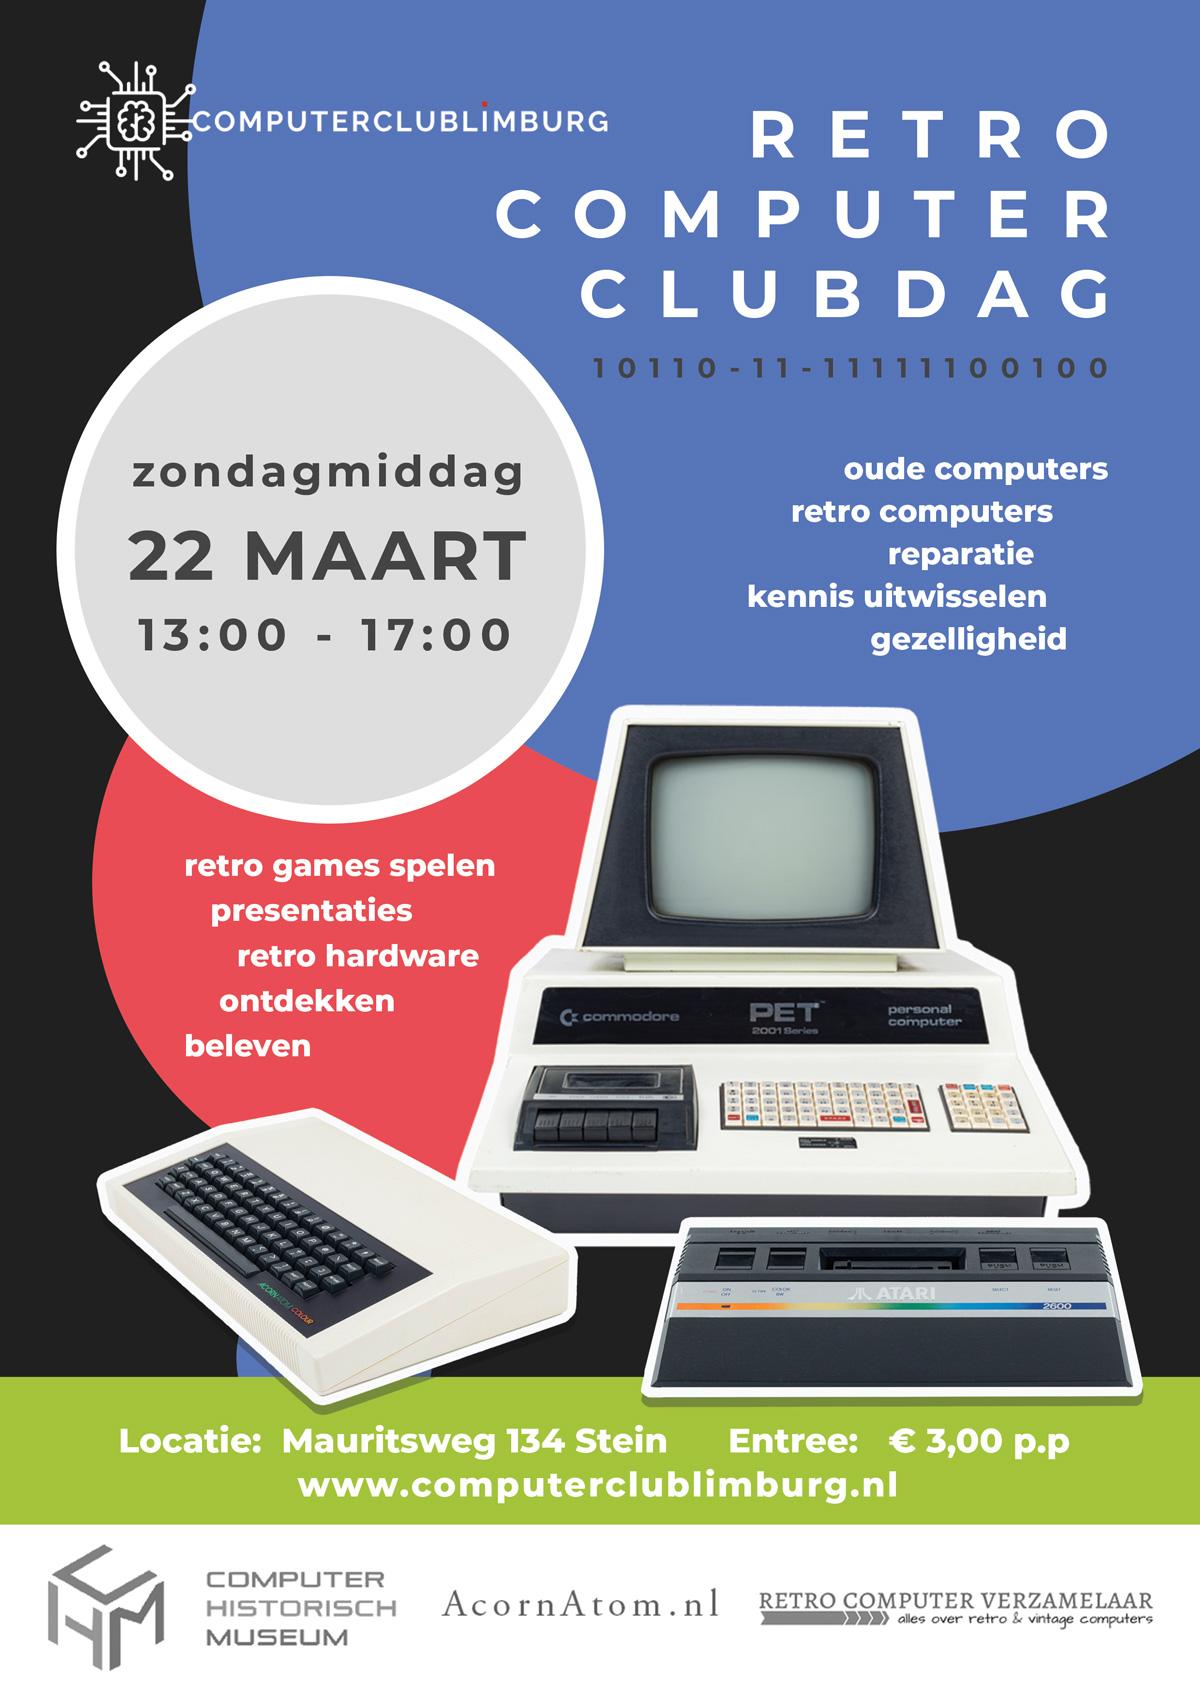 retro-computerclub-limburg-clubdag-editie-1-web